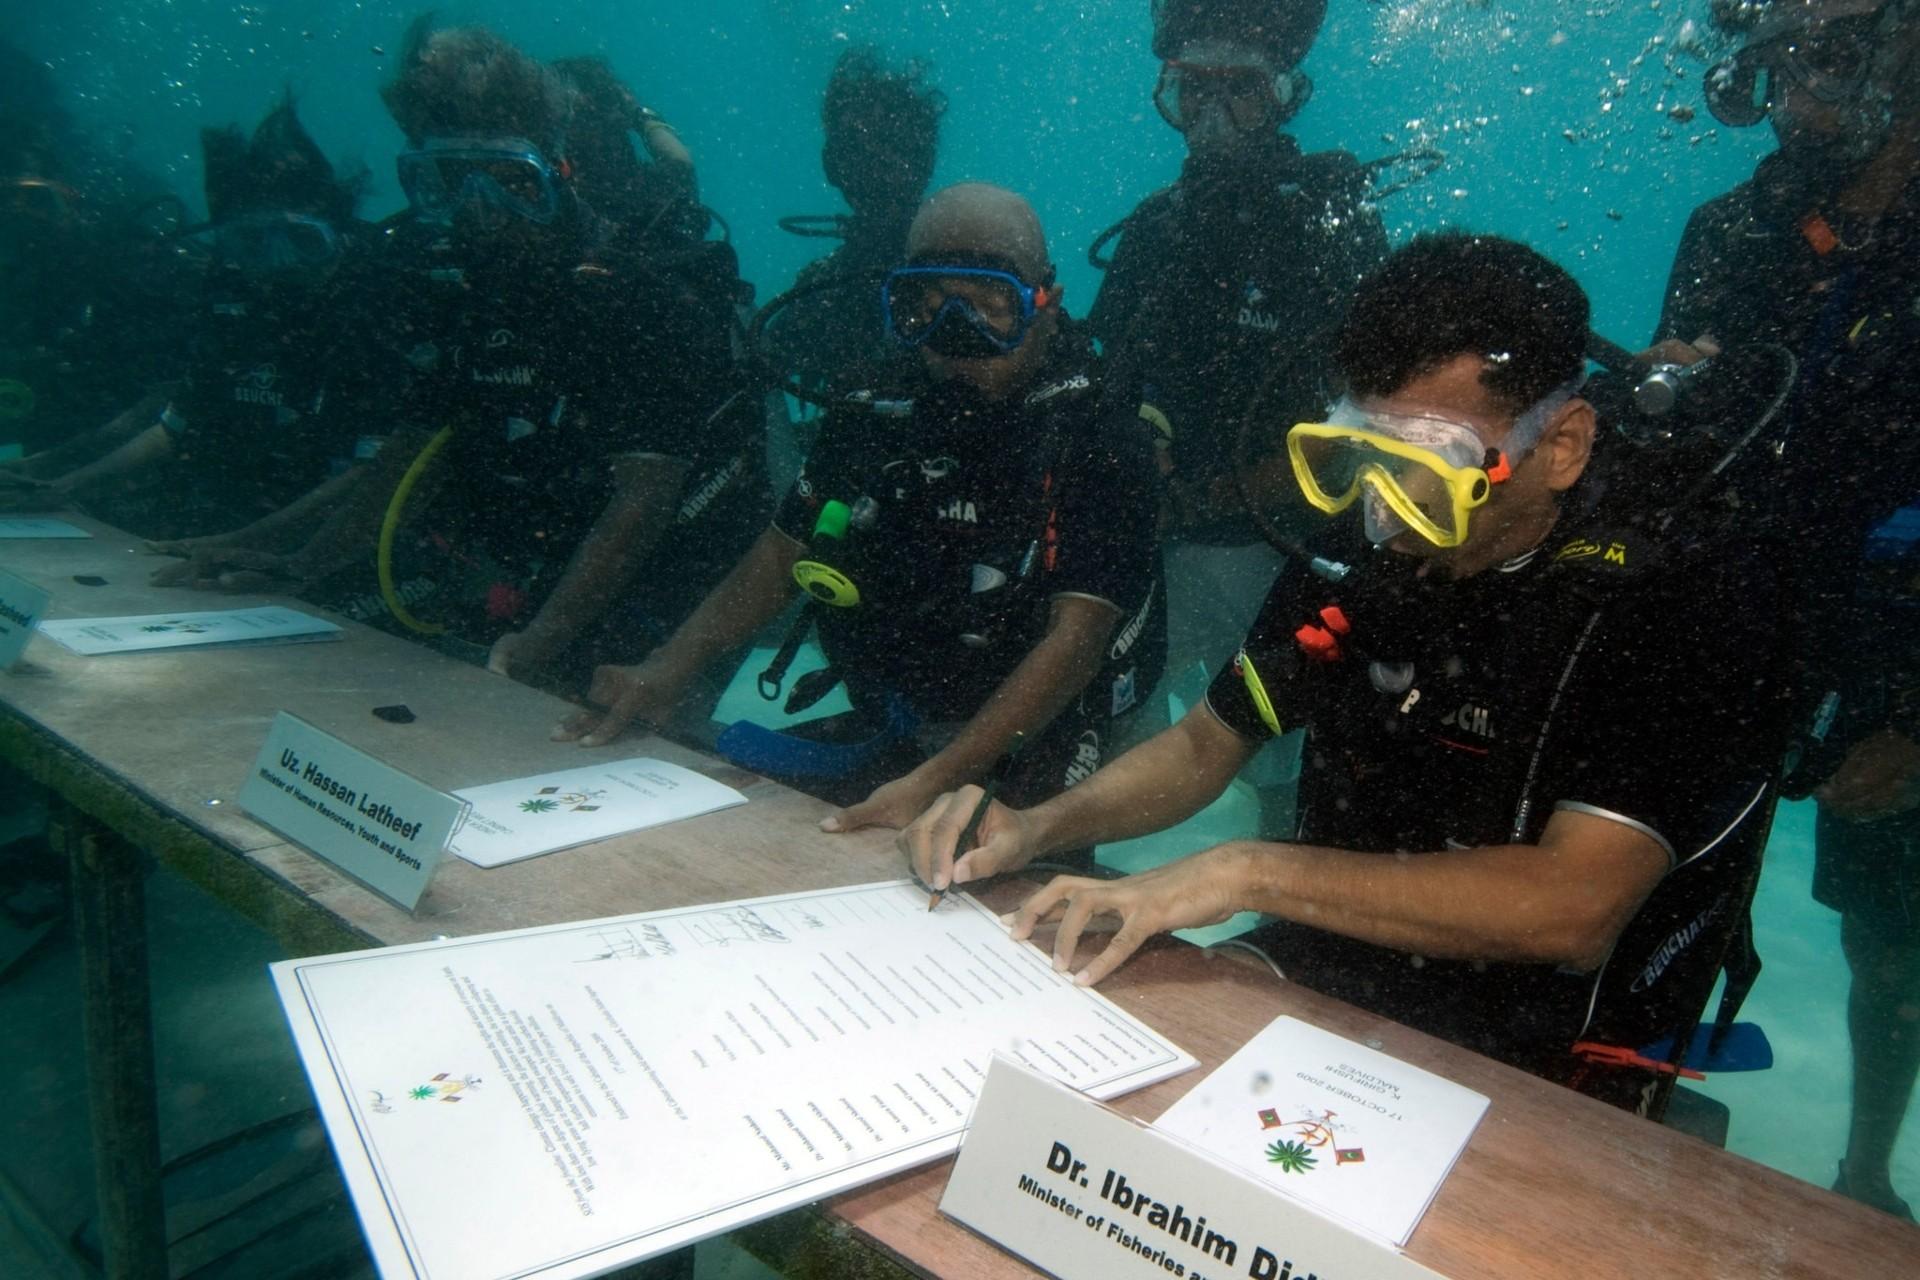 Ibrahim Didi, ministar za ribarstvo i poljoprivredu Maldiva, sa ostalim članovima vlade tokom podvodne sednice organizovane radi isticanja pretnje od globalnog zagrevanja, 17. oktobar 2009. (Foto: AP Photo/Mohammed Seeneen)